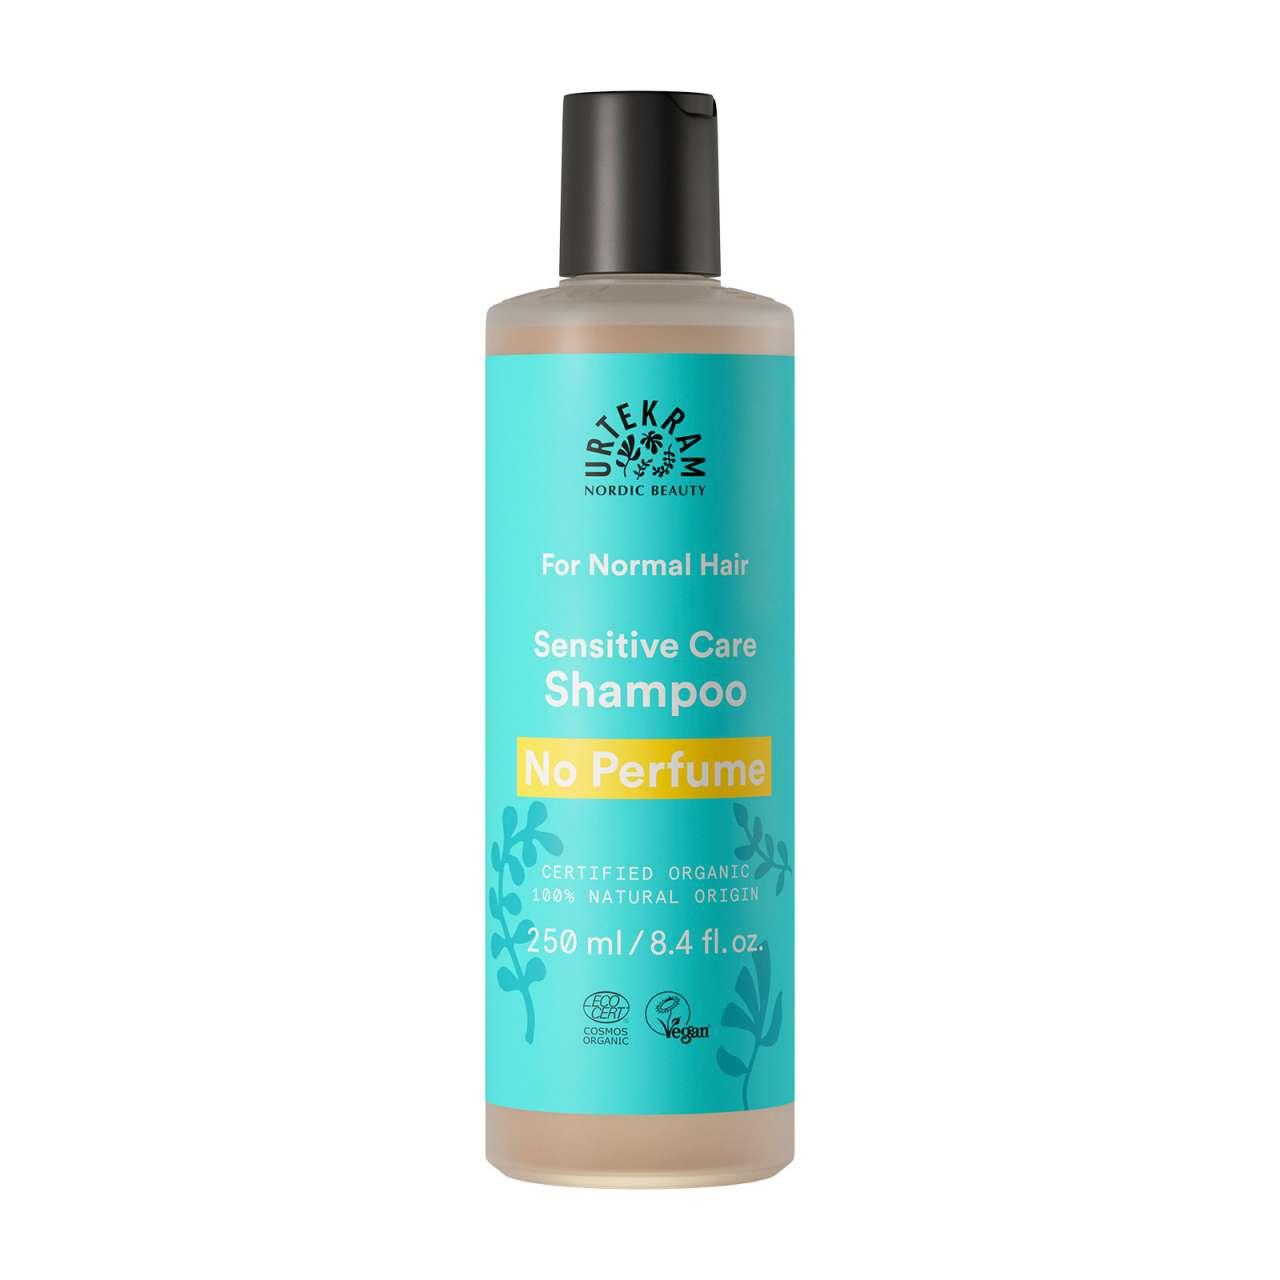 No Perfume Naturkosmetik: Shampoo ohne Silikone